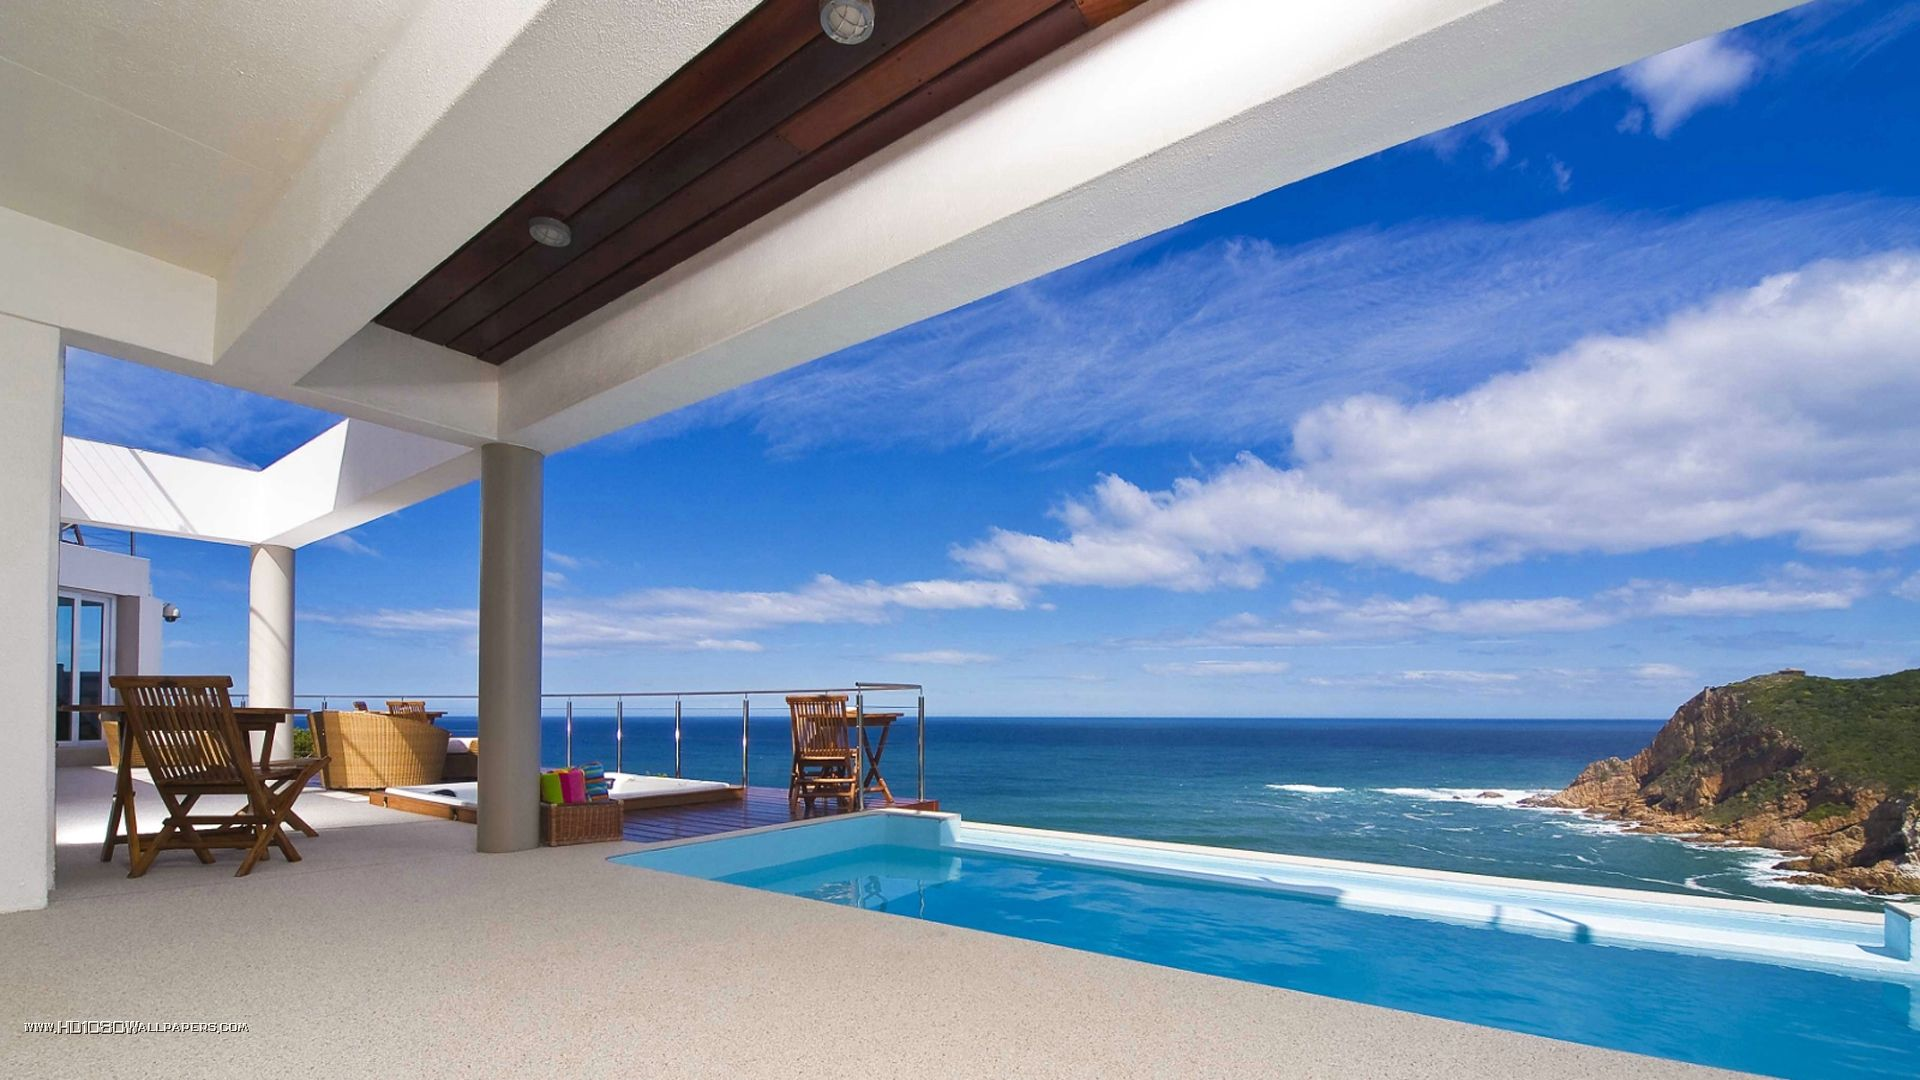 pool overlooking a beach http//luxurylifedesign